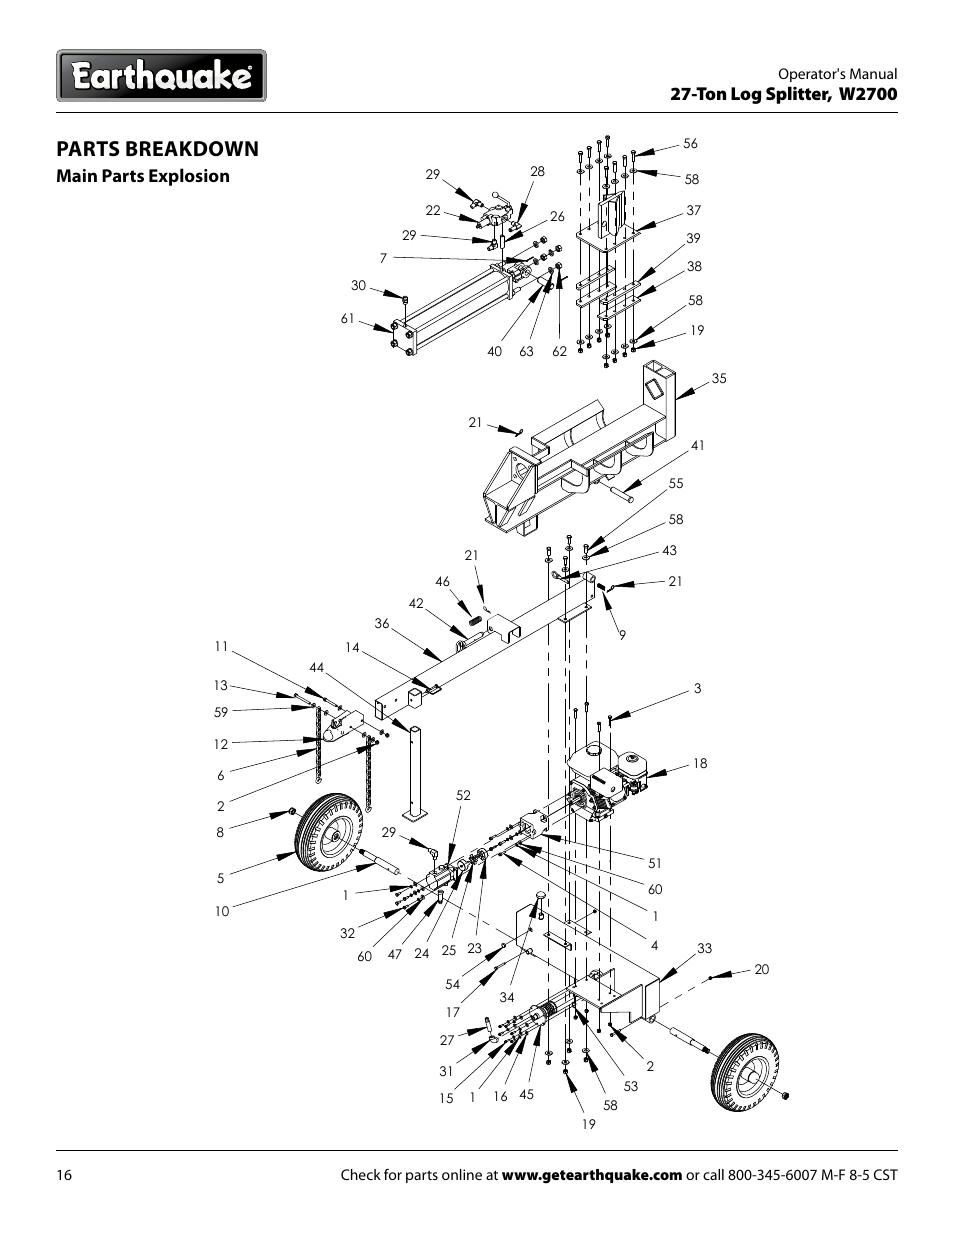 Parts breakdown, Ton log splitter, w2700, Main parts